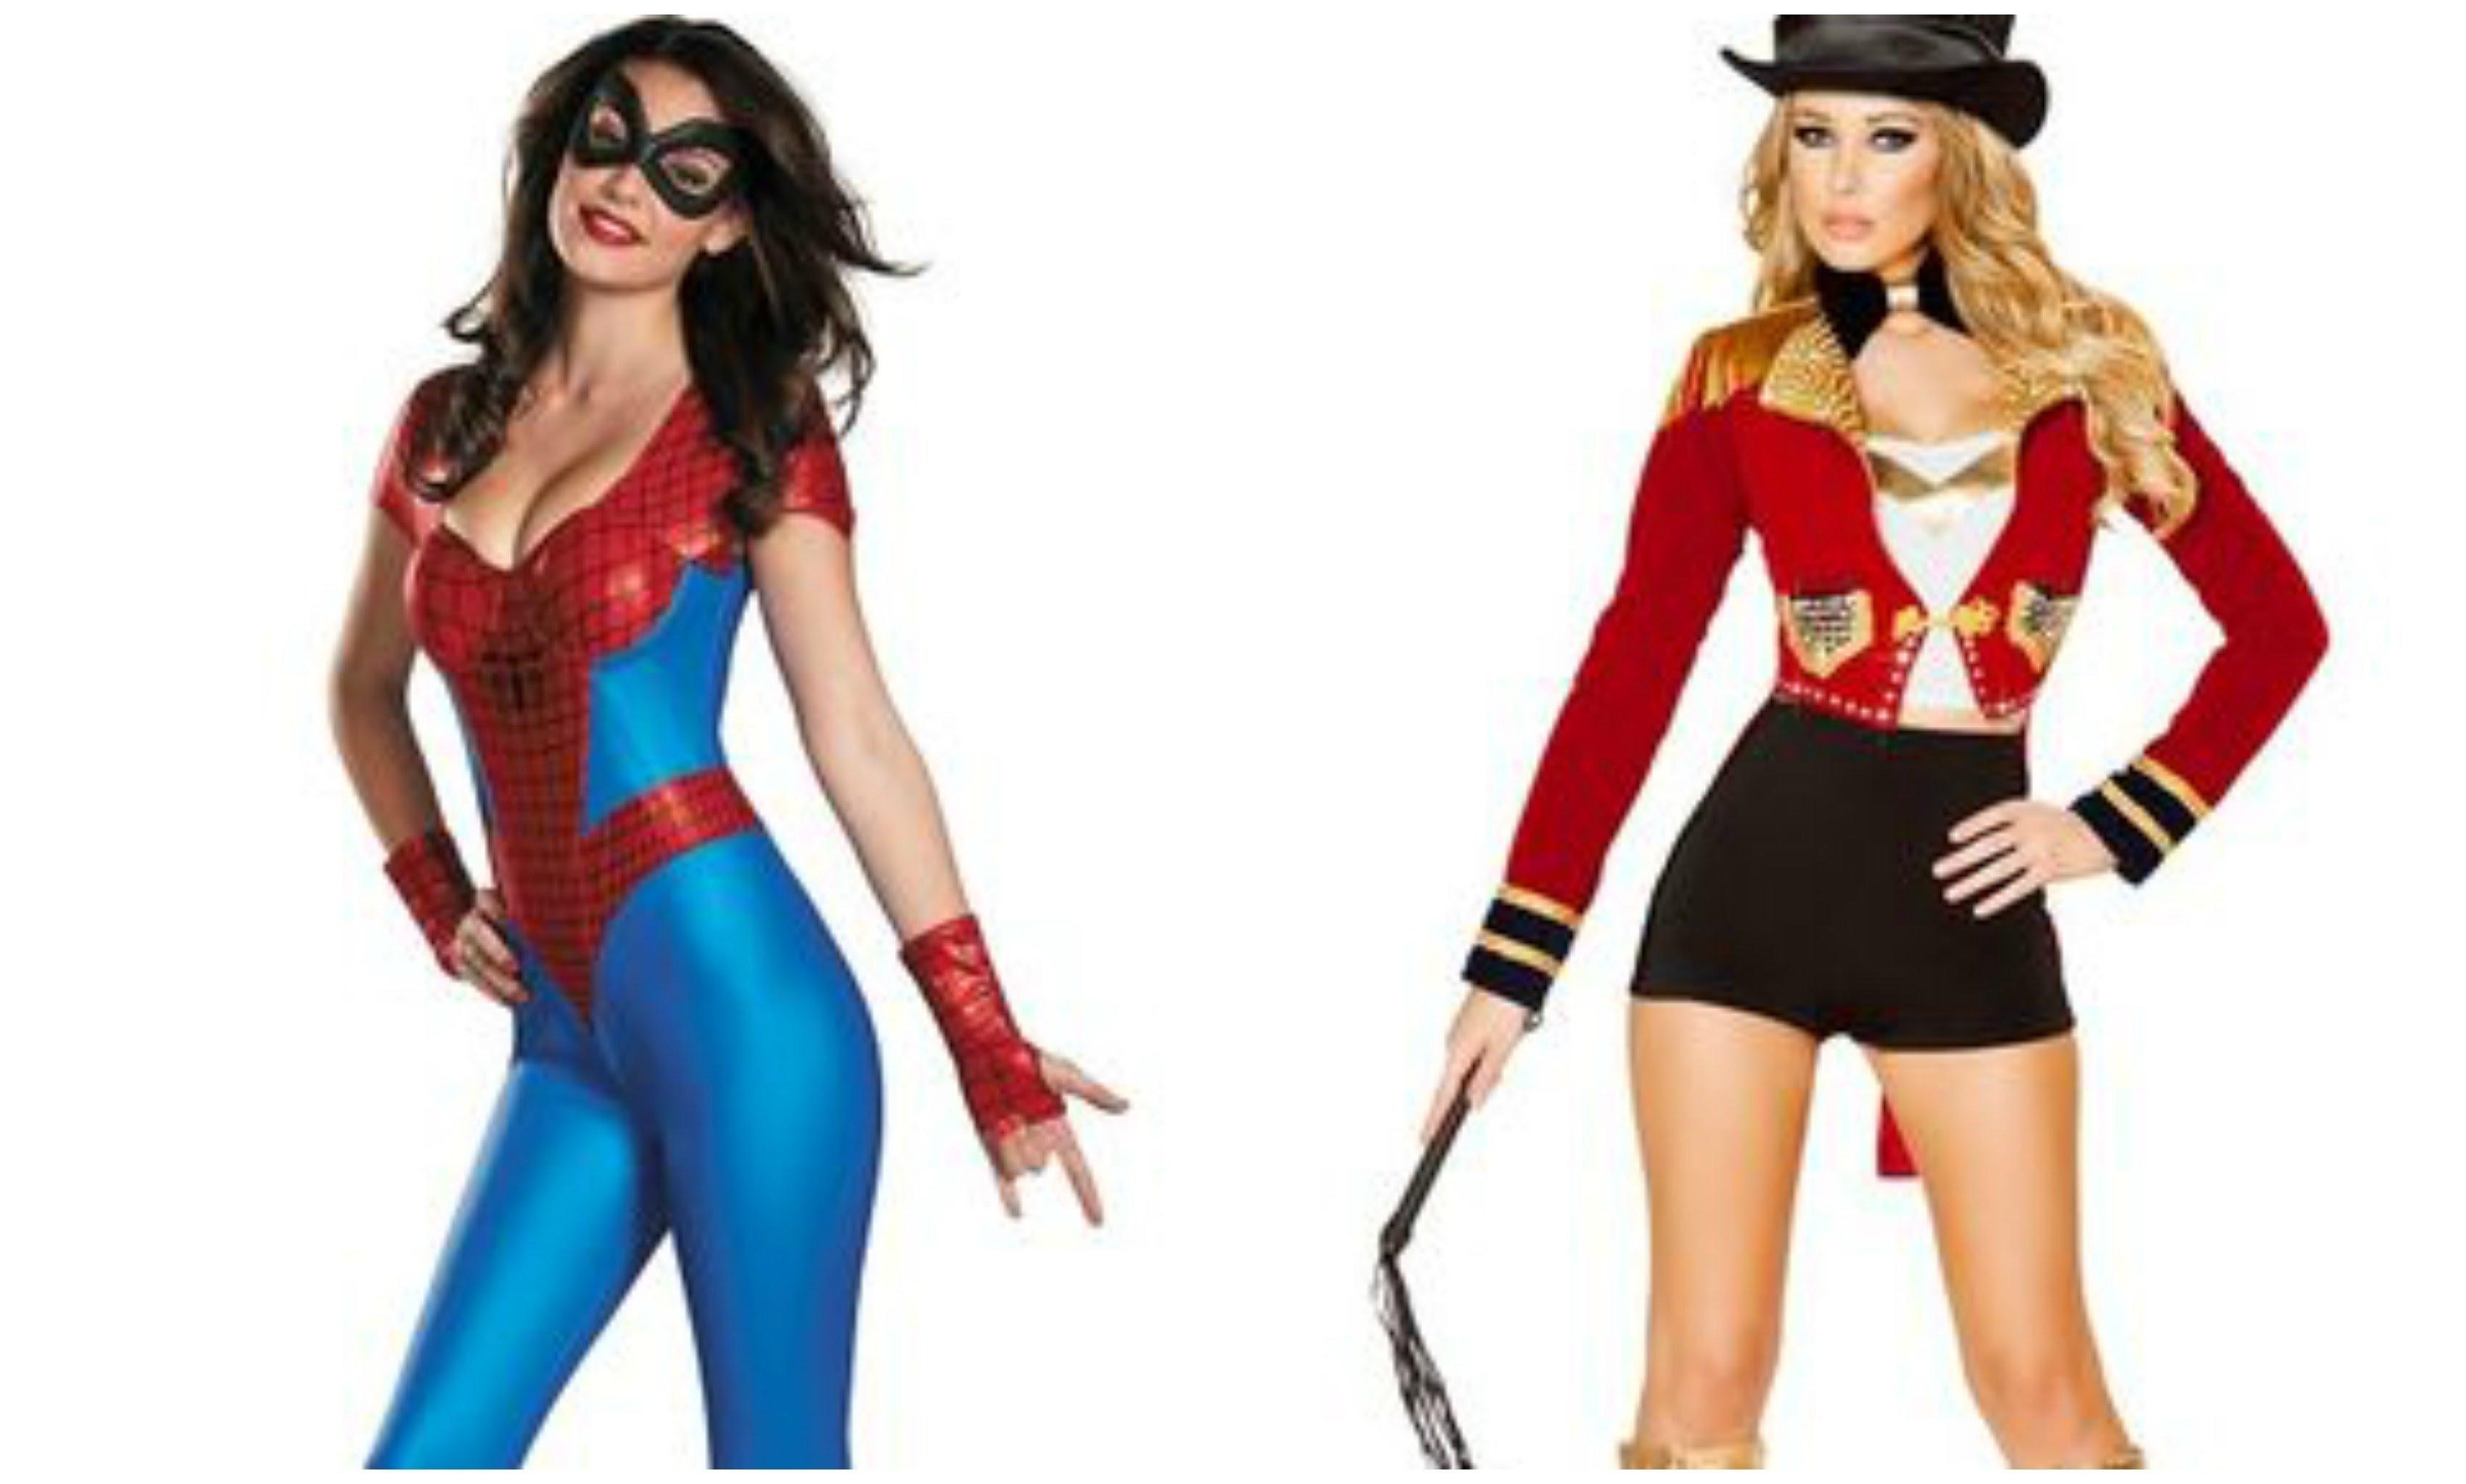 10 Great Cheap Halloween Costume Ideas For Women sexy halloween costumes ideas for women lookbook youtube 4 2020